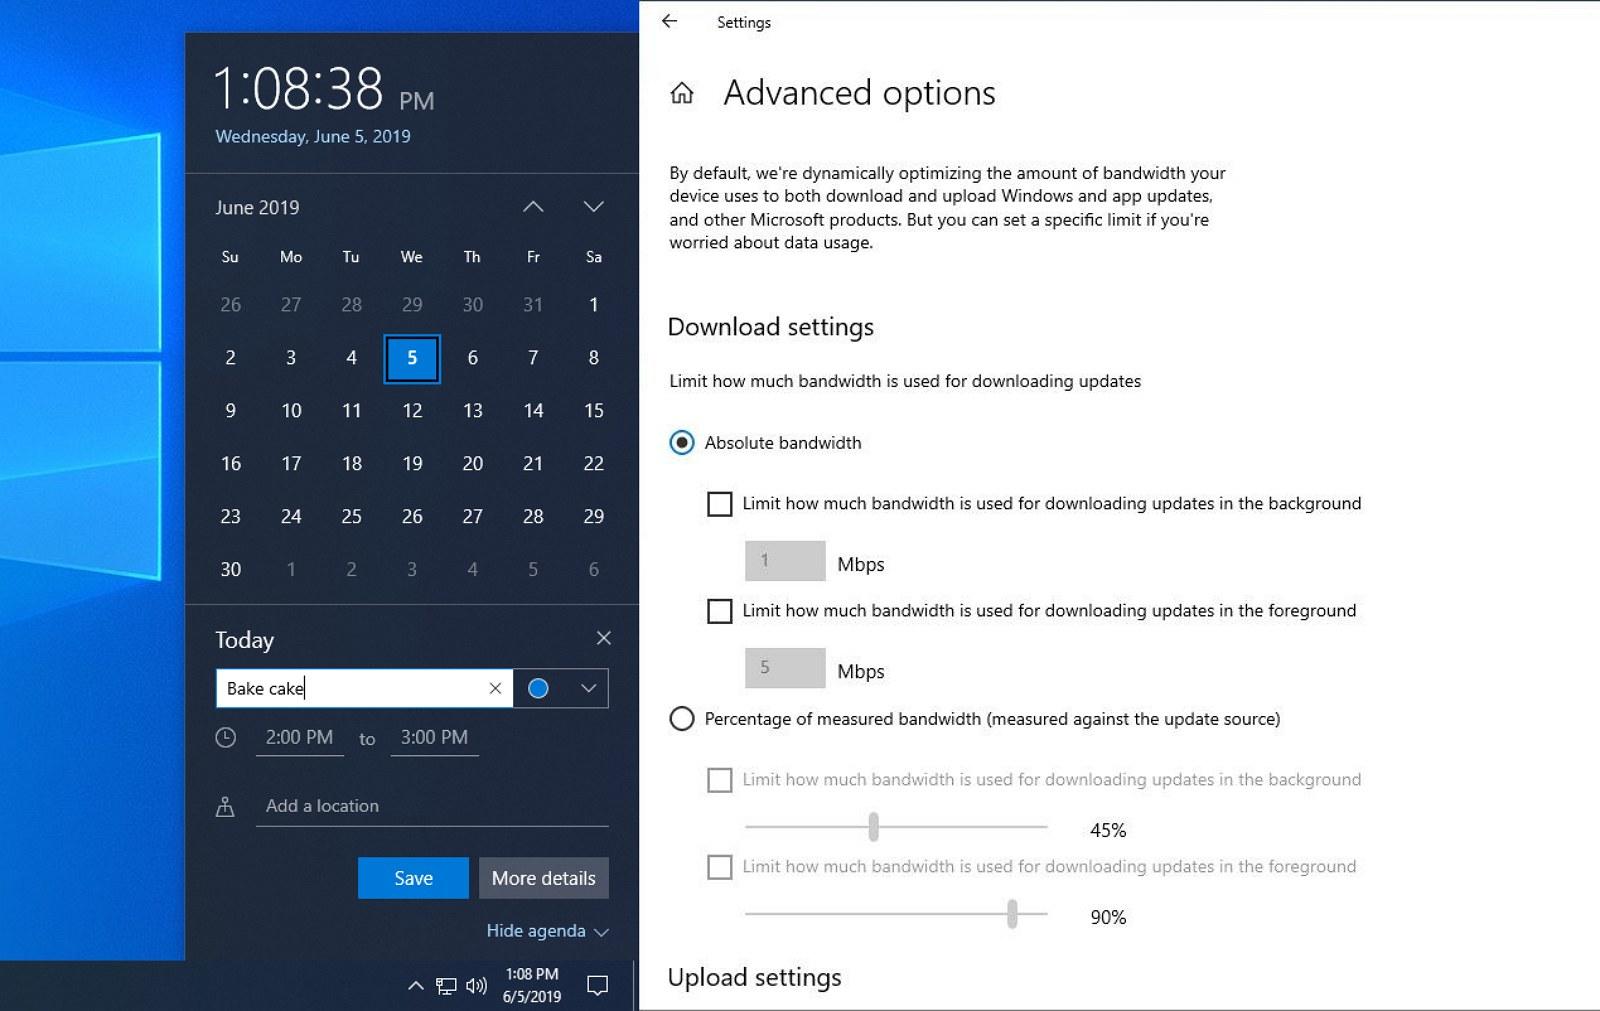 Windows 10 20H1 hidden features on build 18912